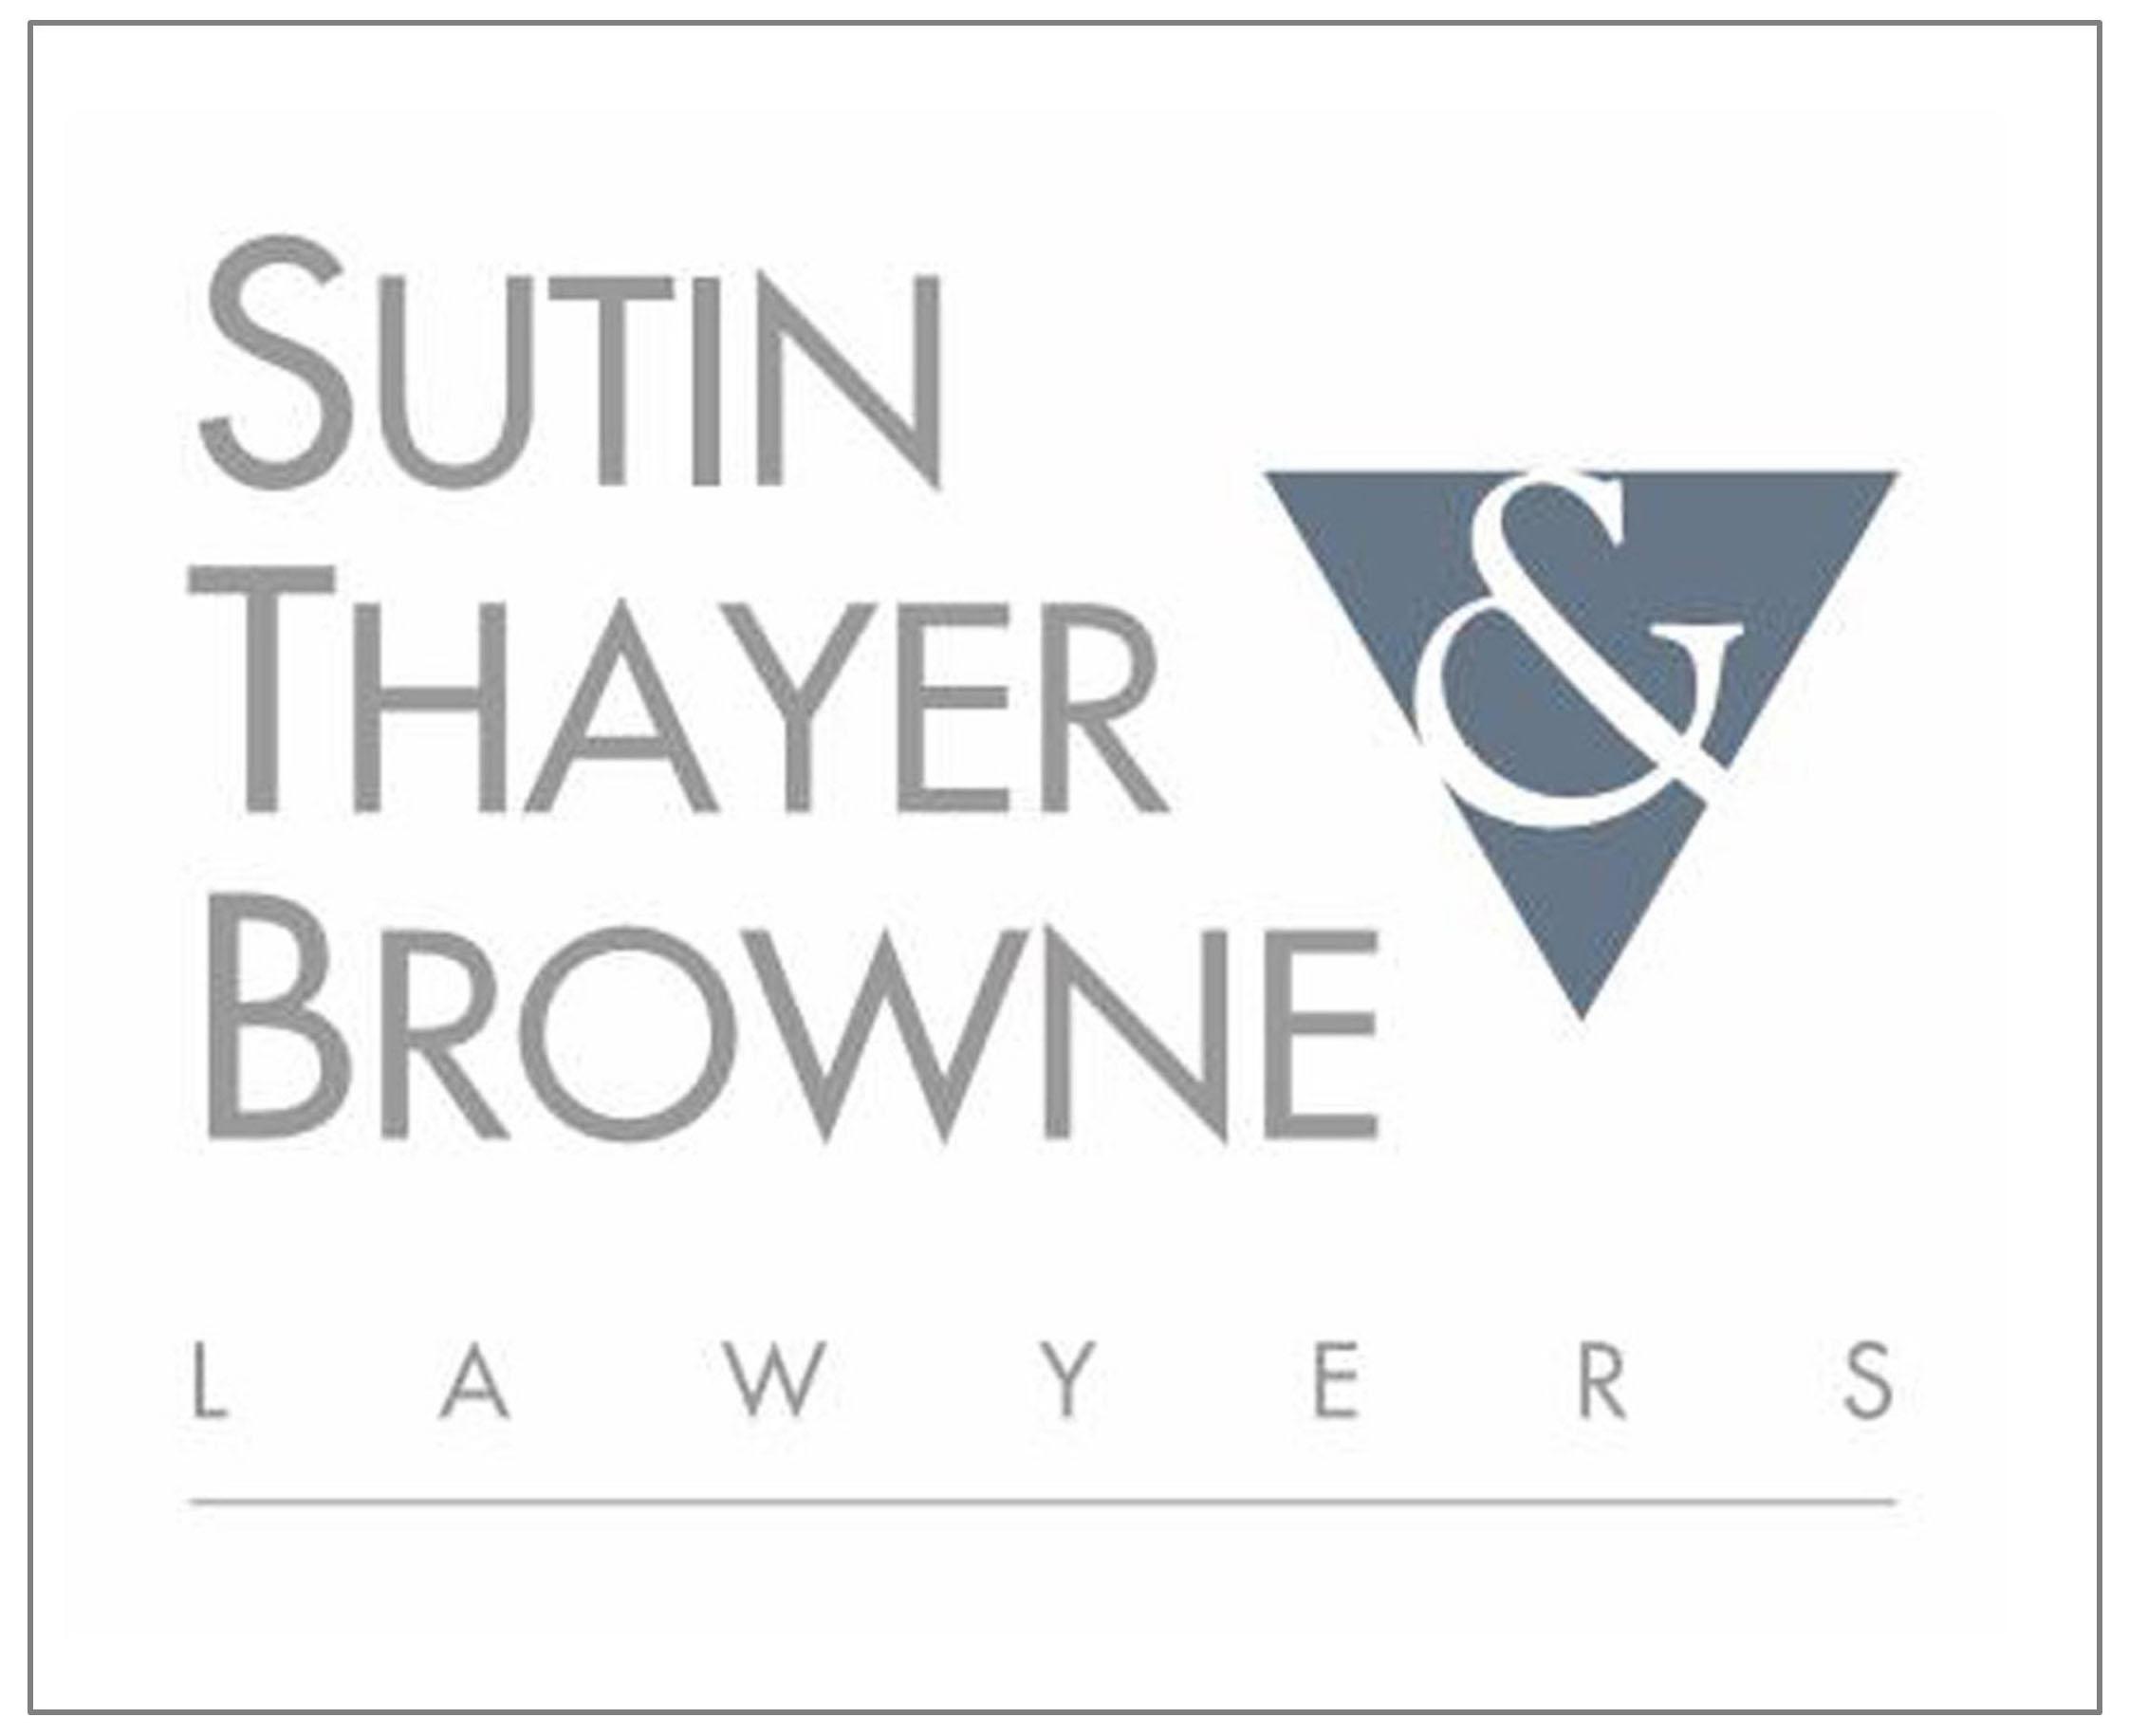 Thank you, Sutin, Thayer & Browne Lawyers!